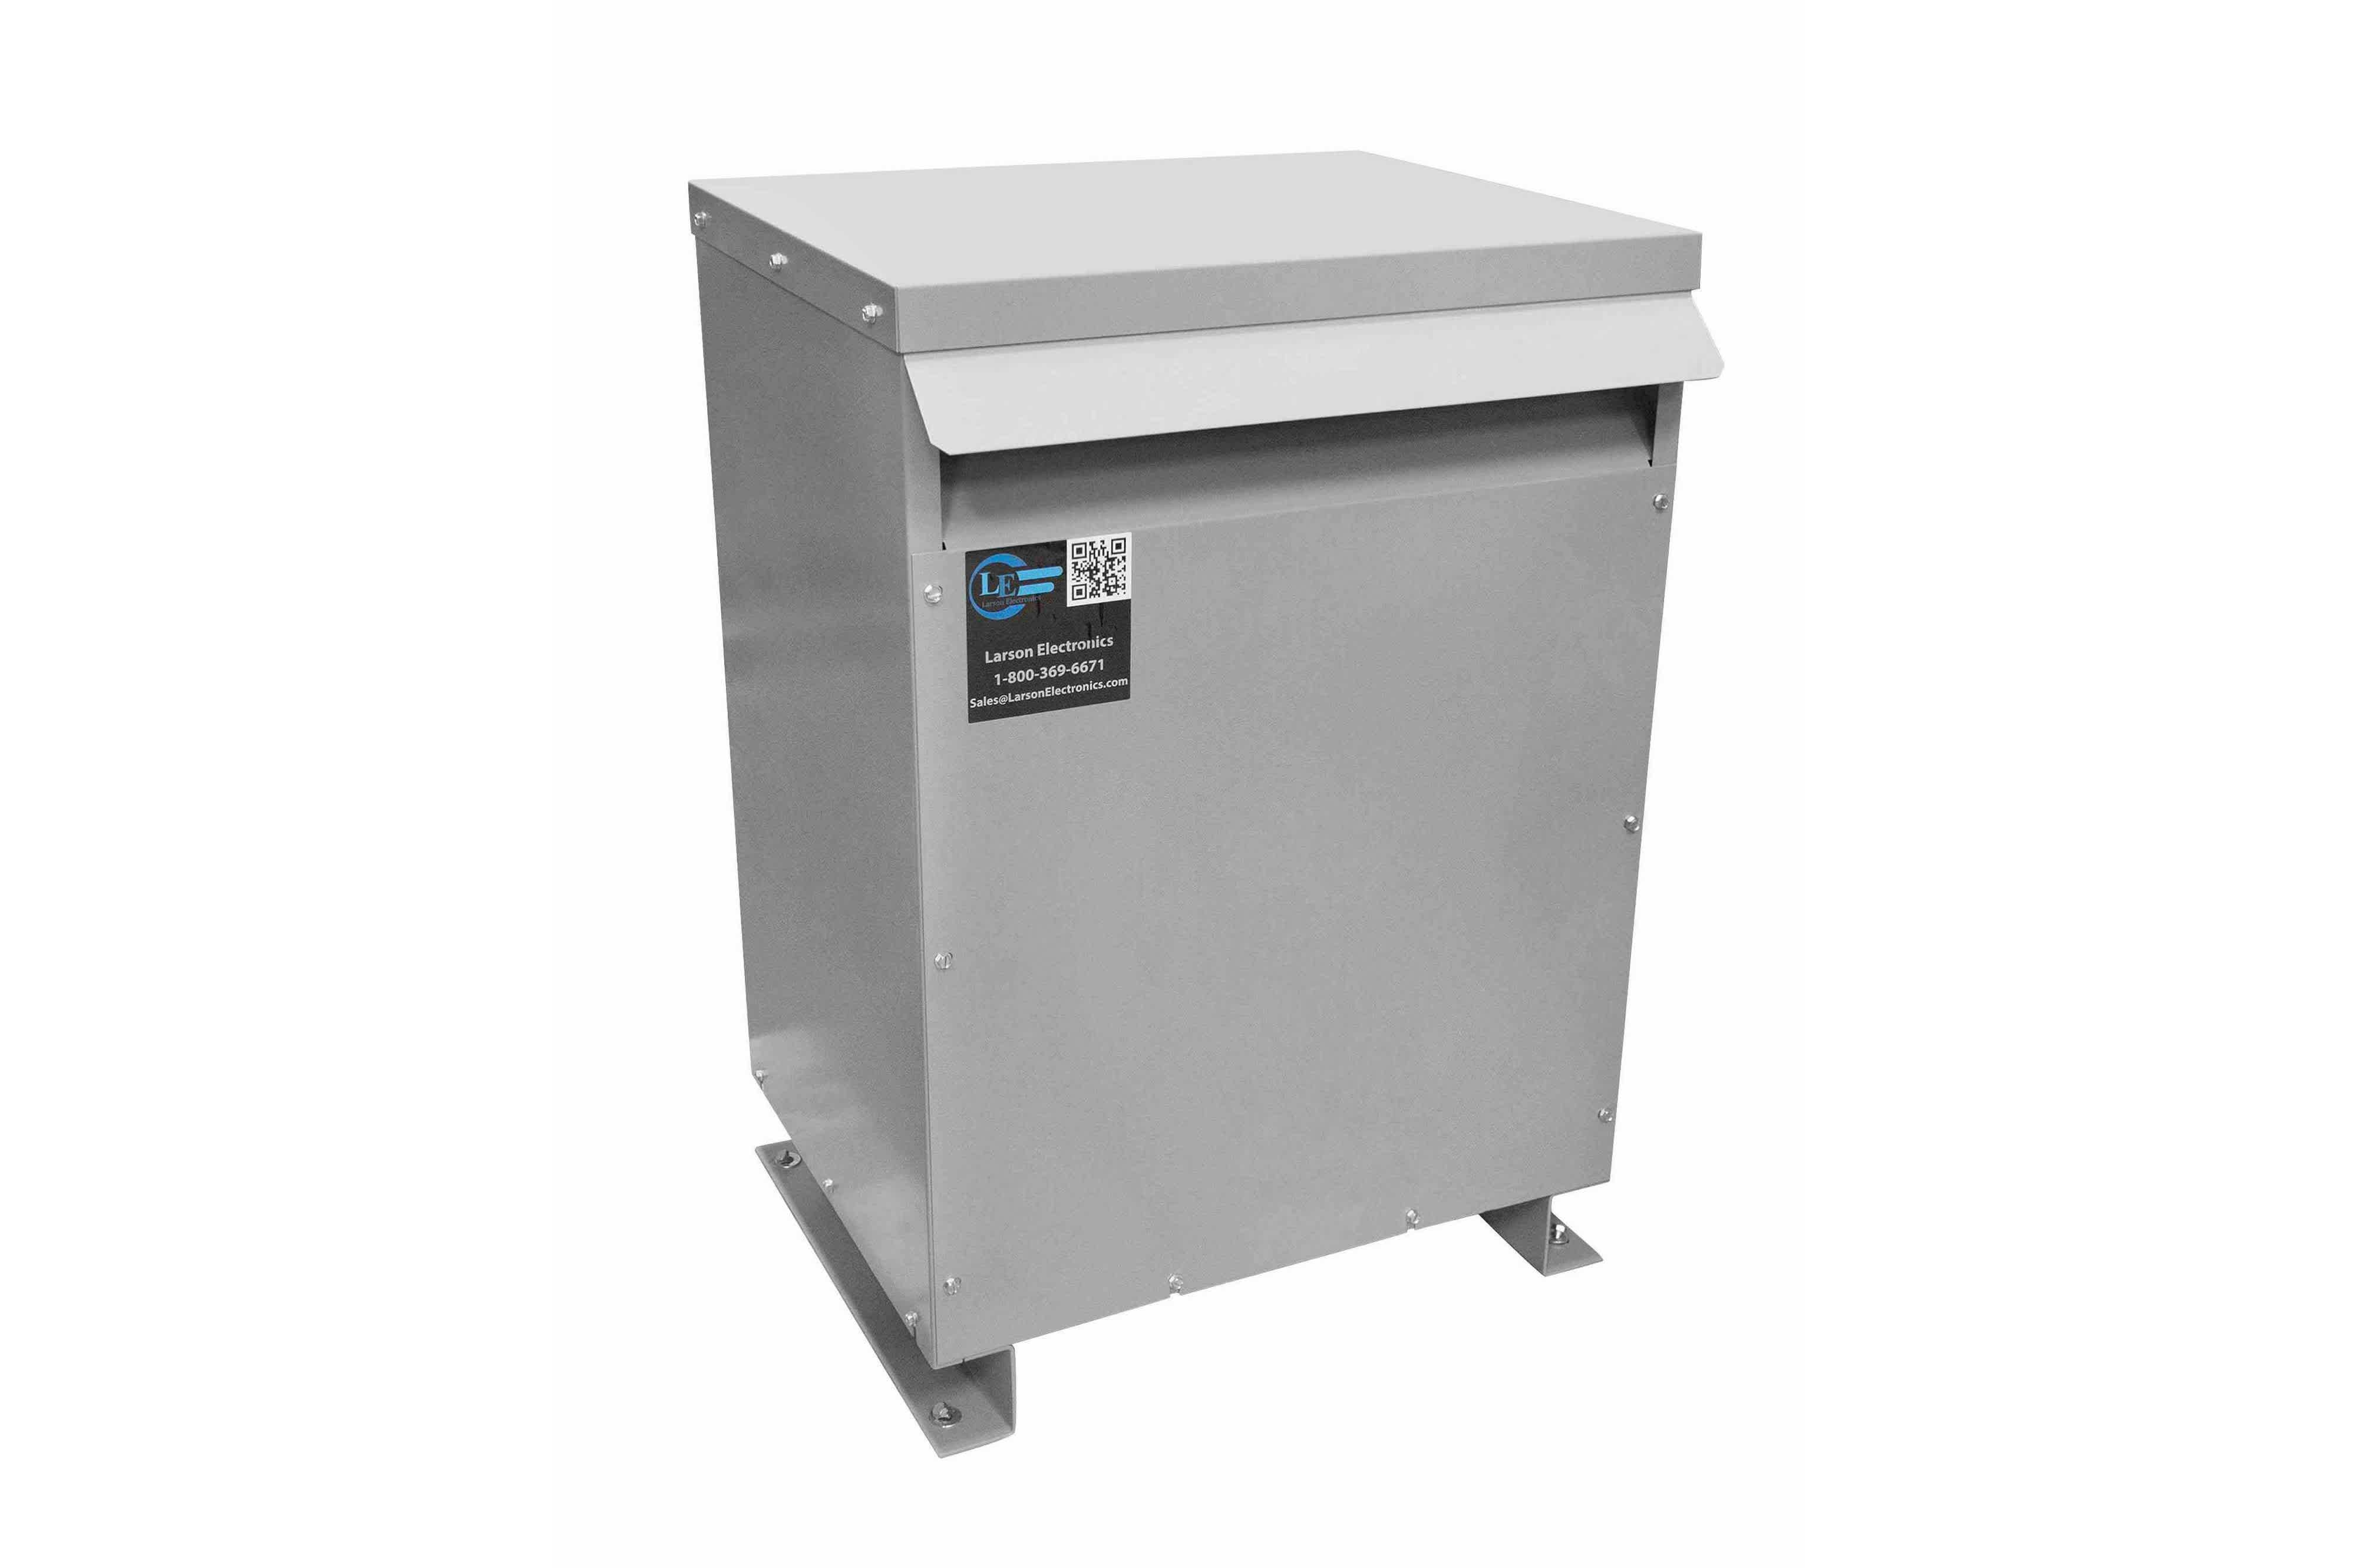 500 kVA 3PH Isolation Transformer, 208V Wye Primary, 400Y/231 Wye-N Secondary, N3R, Ventilated, 60 Hz